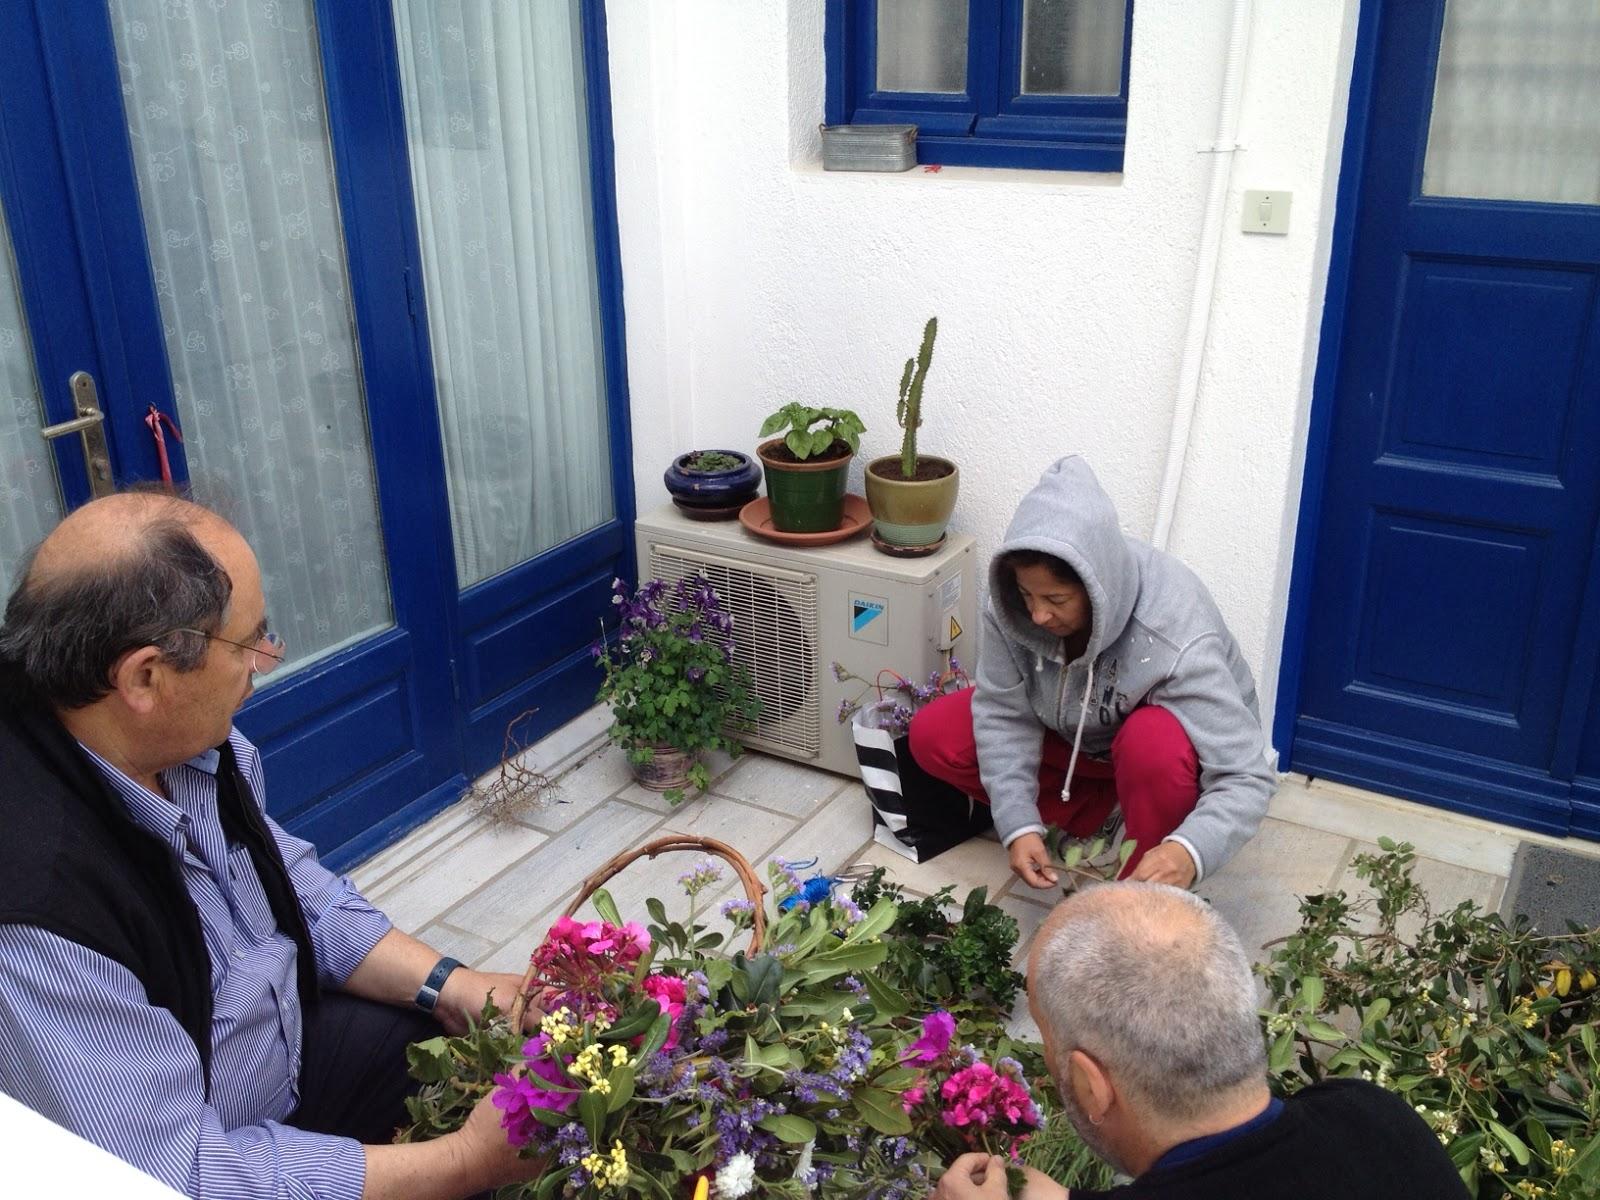 May Day wreath making in Mykonos